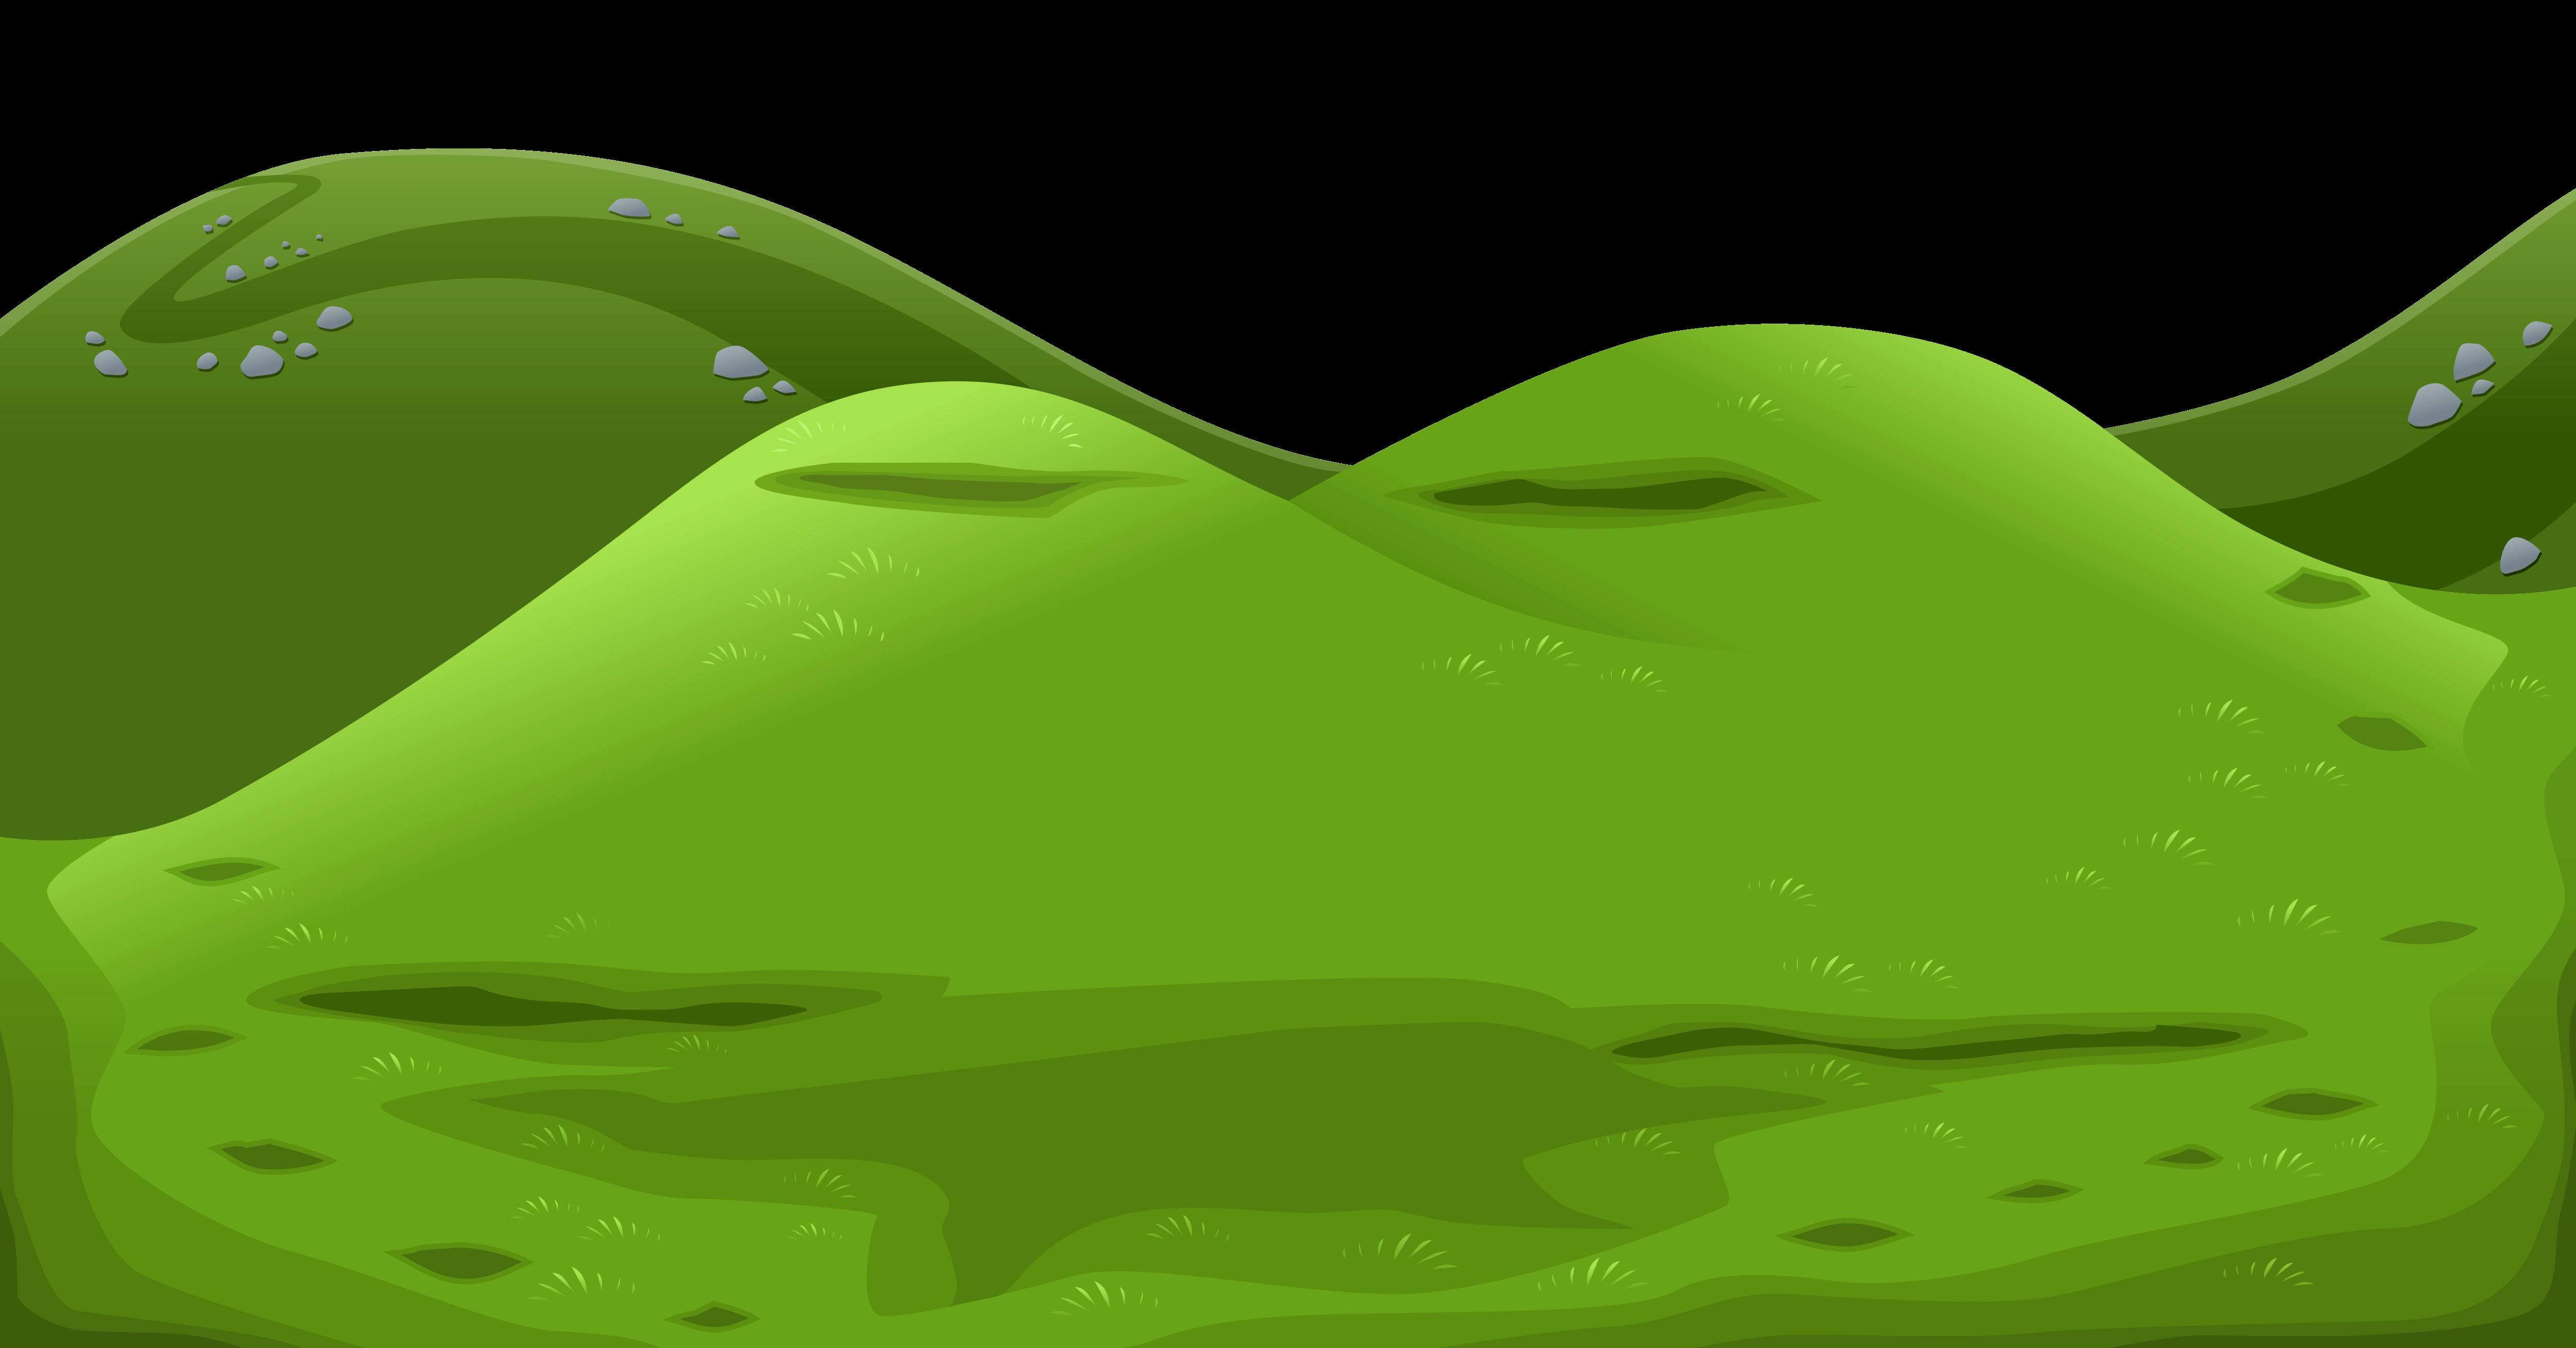 Hills clipart transparent, Hills transparent Transparent.